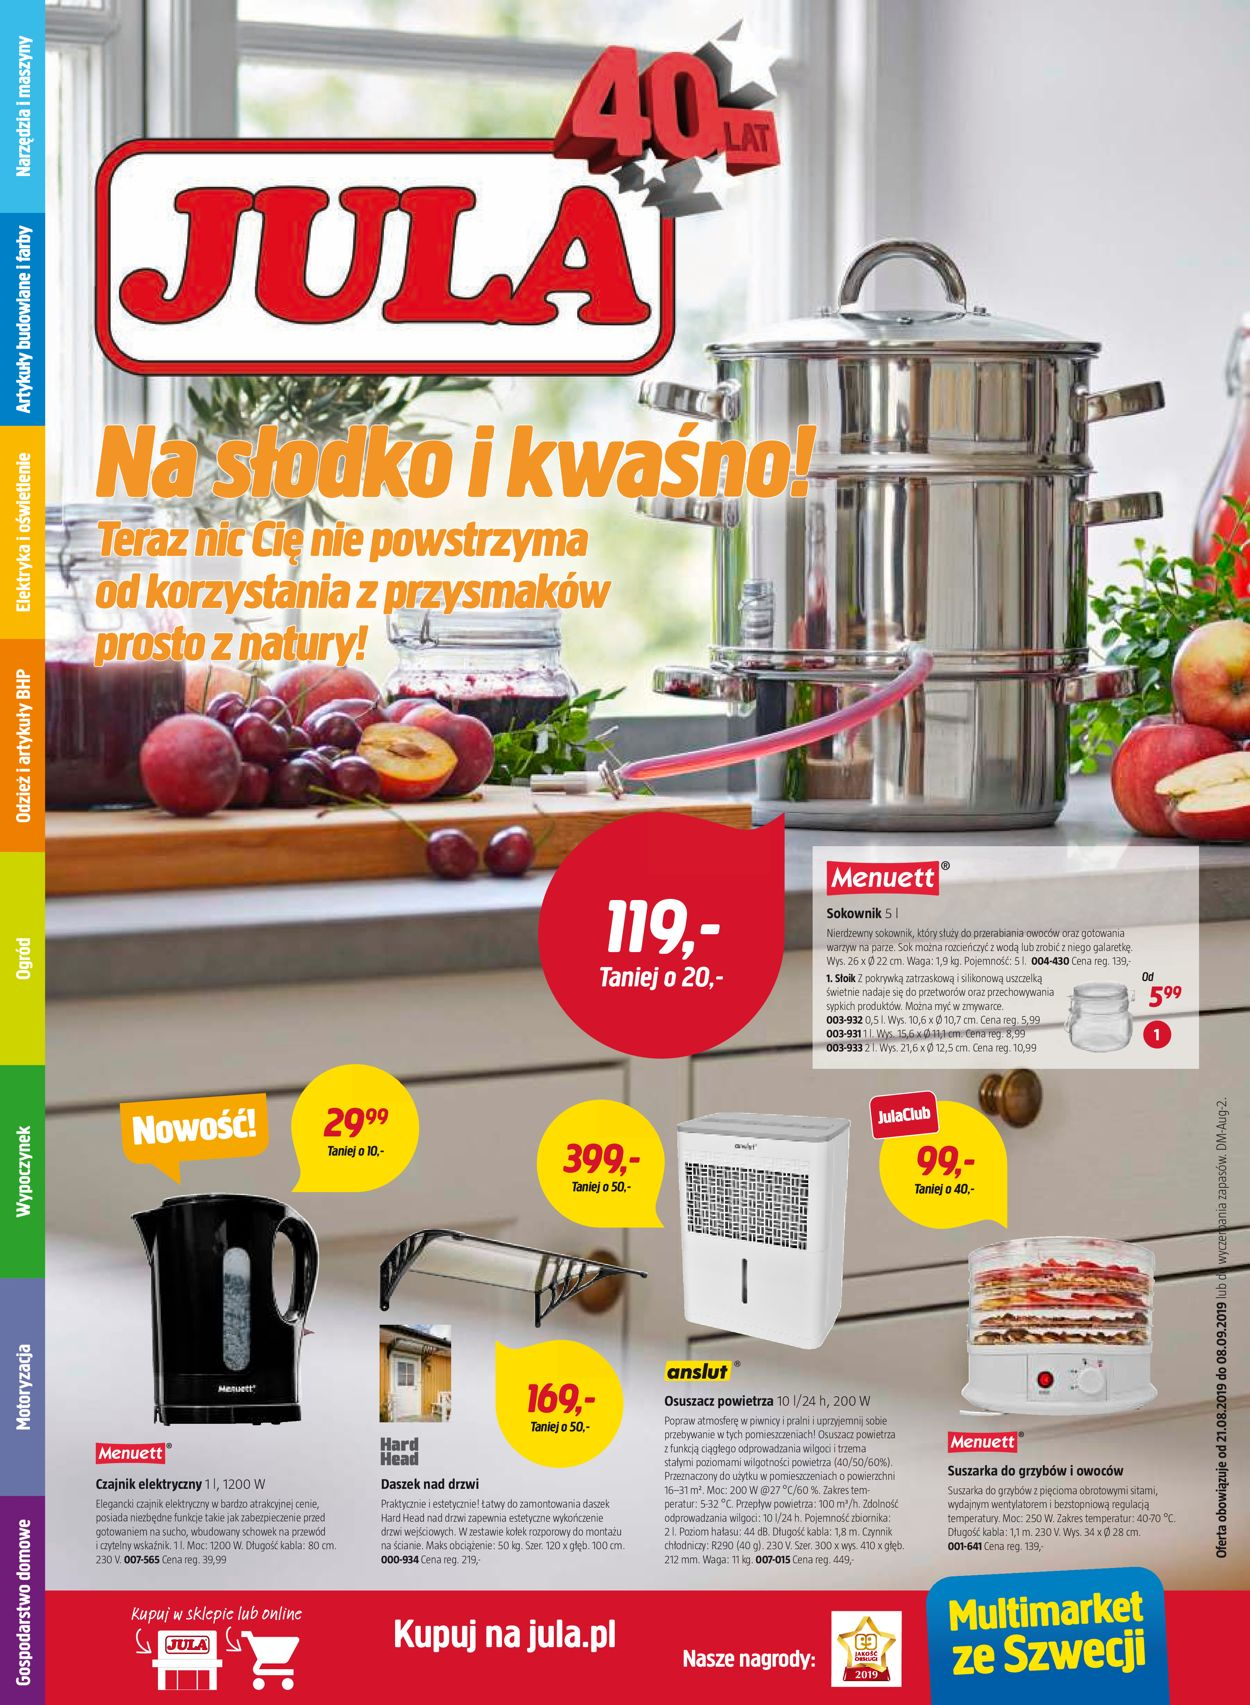 Gazetka promocyjna Jula - 21.08-08.09.2019